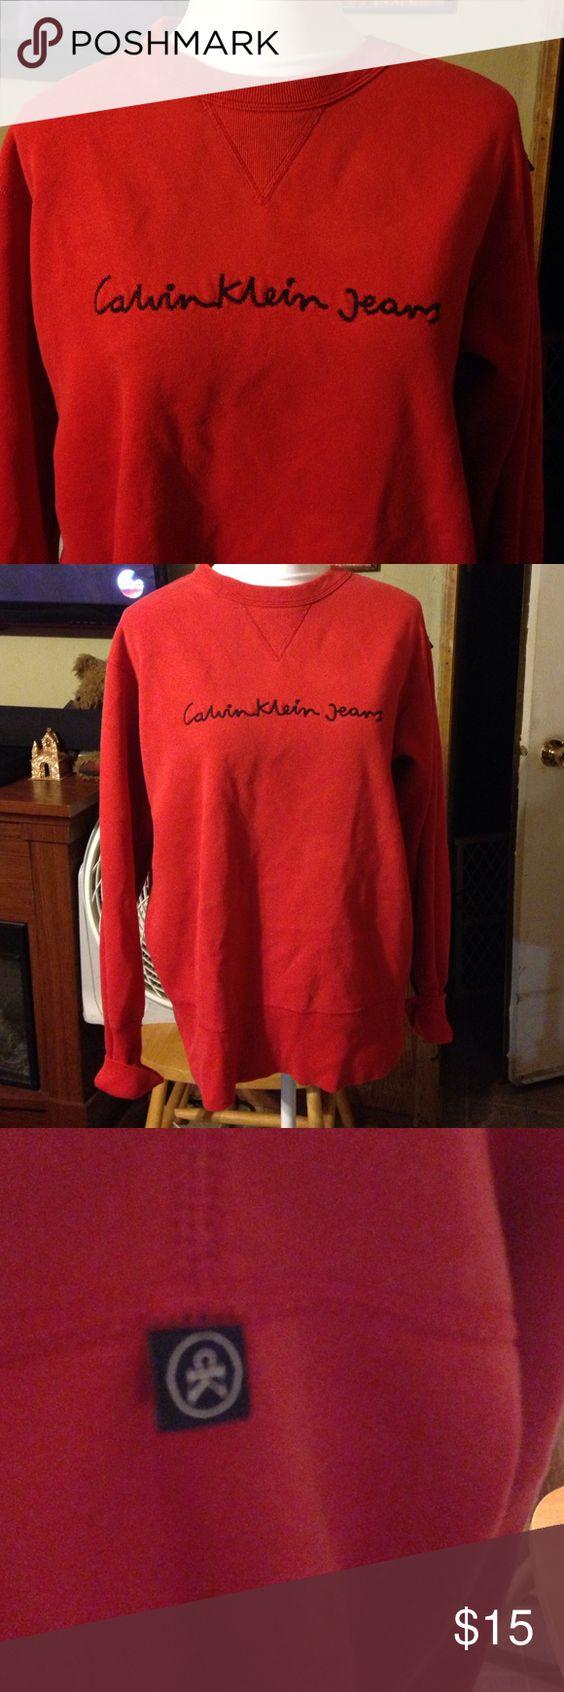 Calvin Klein Jeans oversized sweatshirt. Sz S Calvin Klein Jeans oversized sweatshirt. Sz S Calvin Klein Jeans Tops Sweatshirts & Hoodies